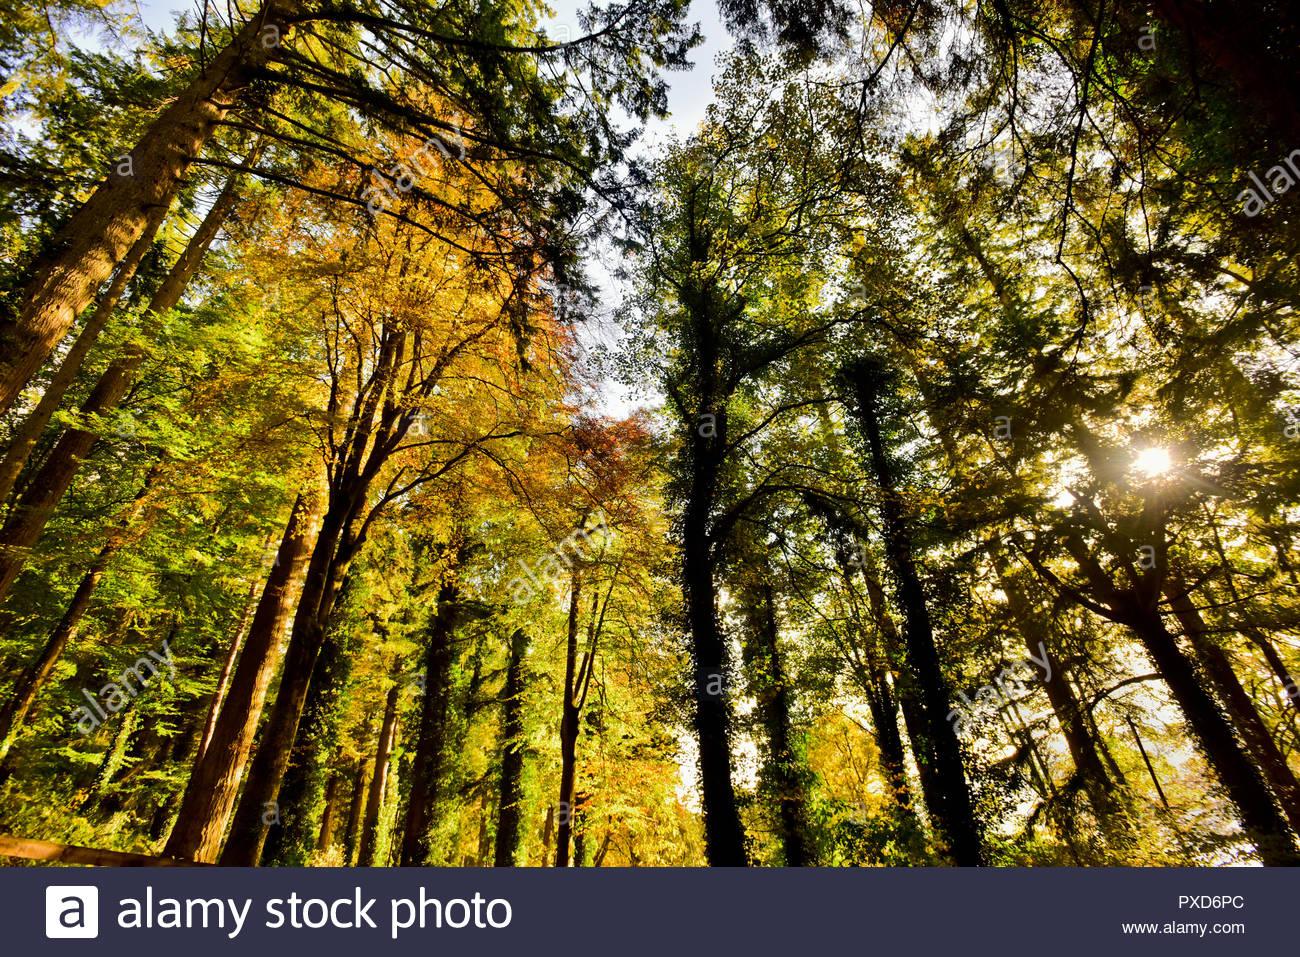 Autumn sun shining through trees at Lake Vyrnwyin Powys, Wales, UK - Stock Image